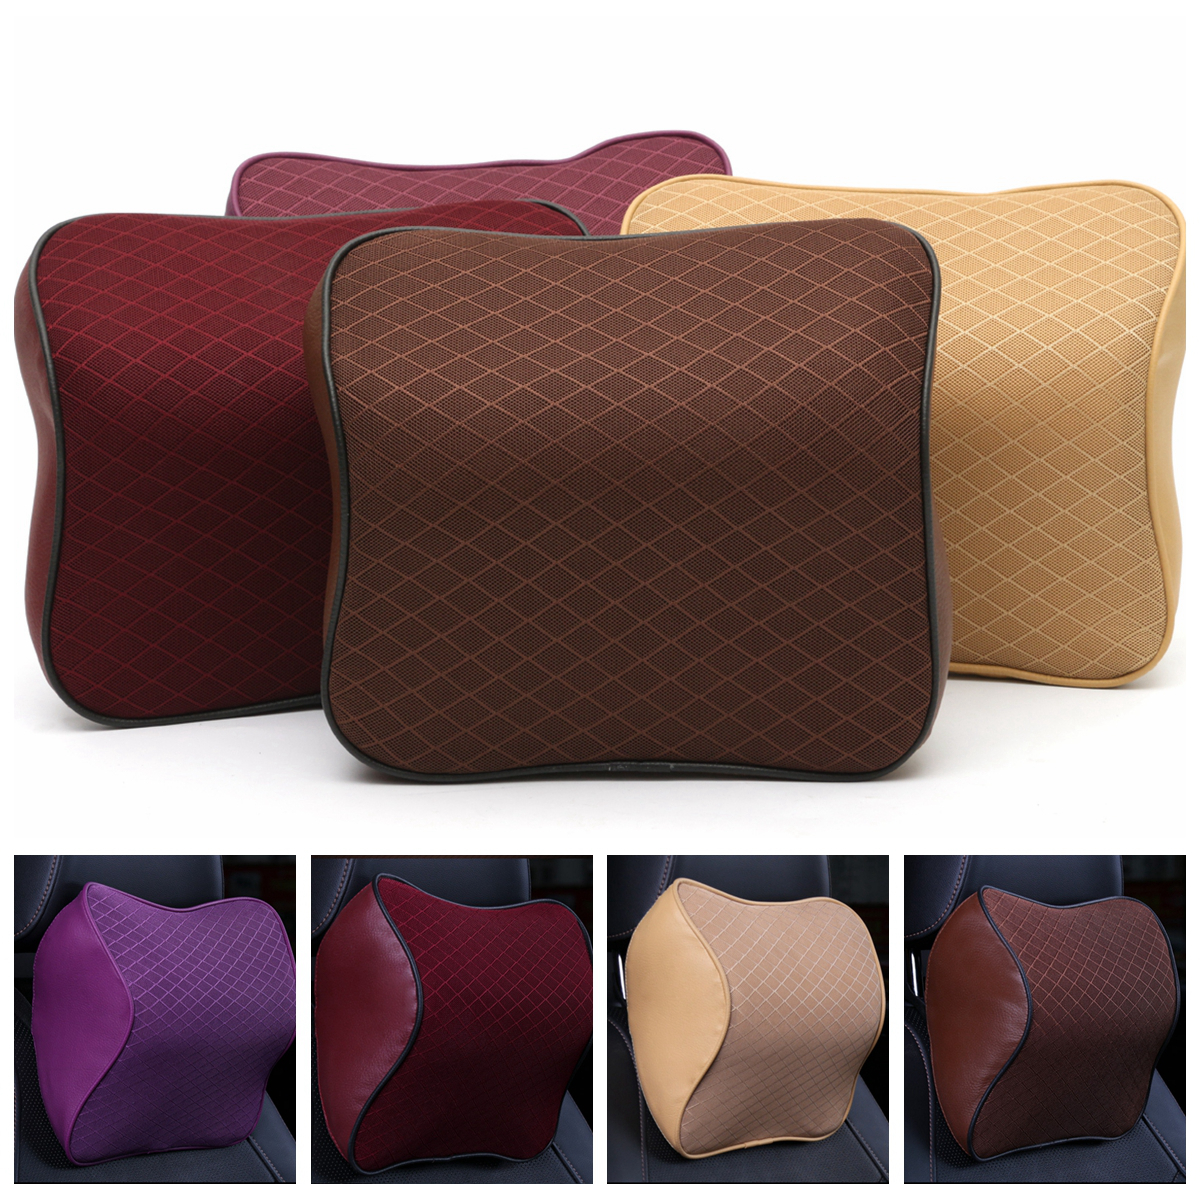 Neck Cushion Car Seat Headrest neckguard cushion Pillow Breathable Mesh PU Leather Pad Memory Foam (Color: Beige, Wine red, Coffee, Purple)